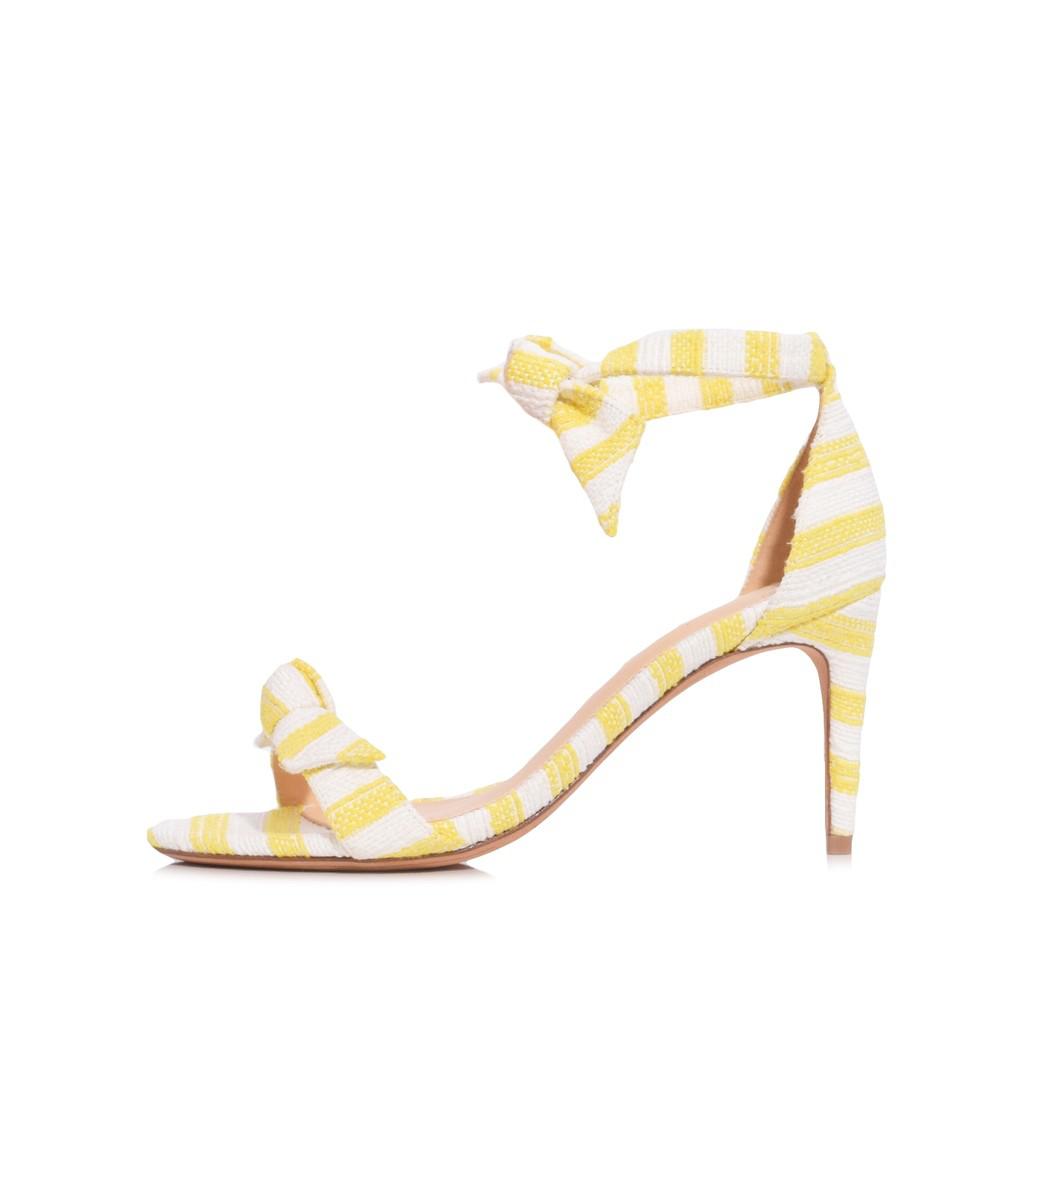 16eb7257993 Clarita Heel In Sunflower in Yellow